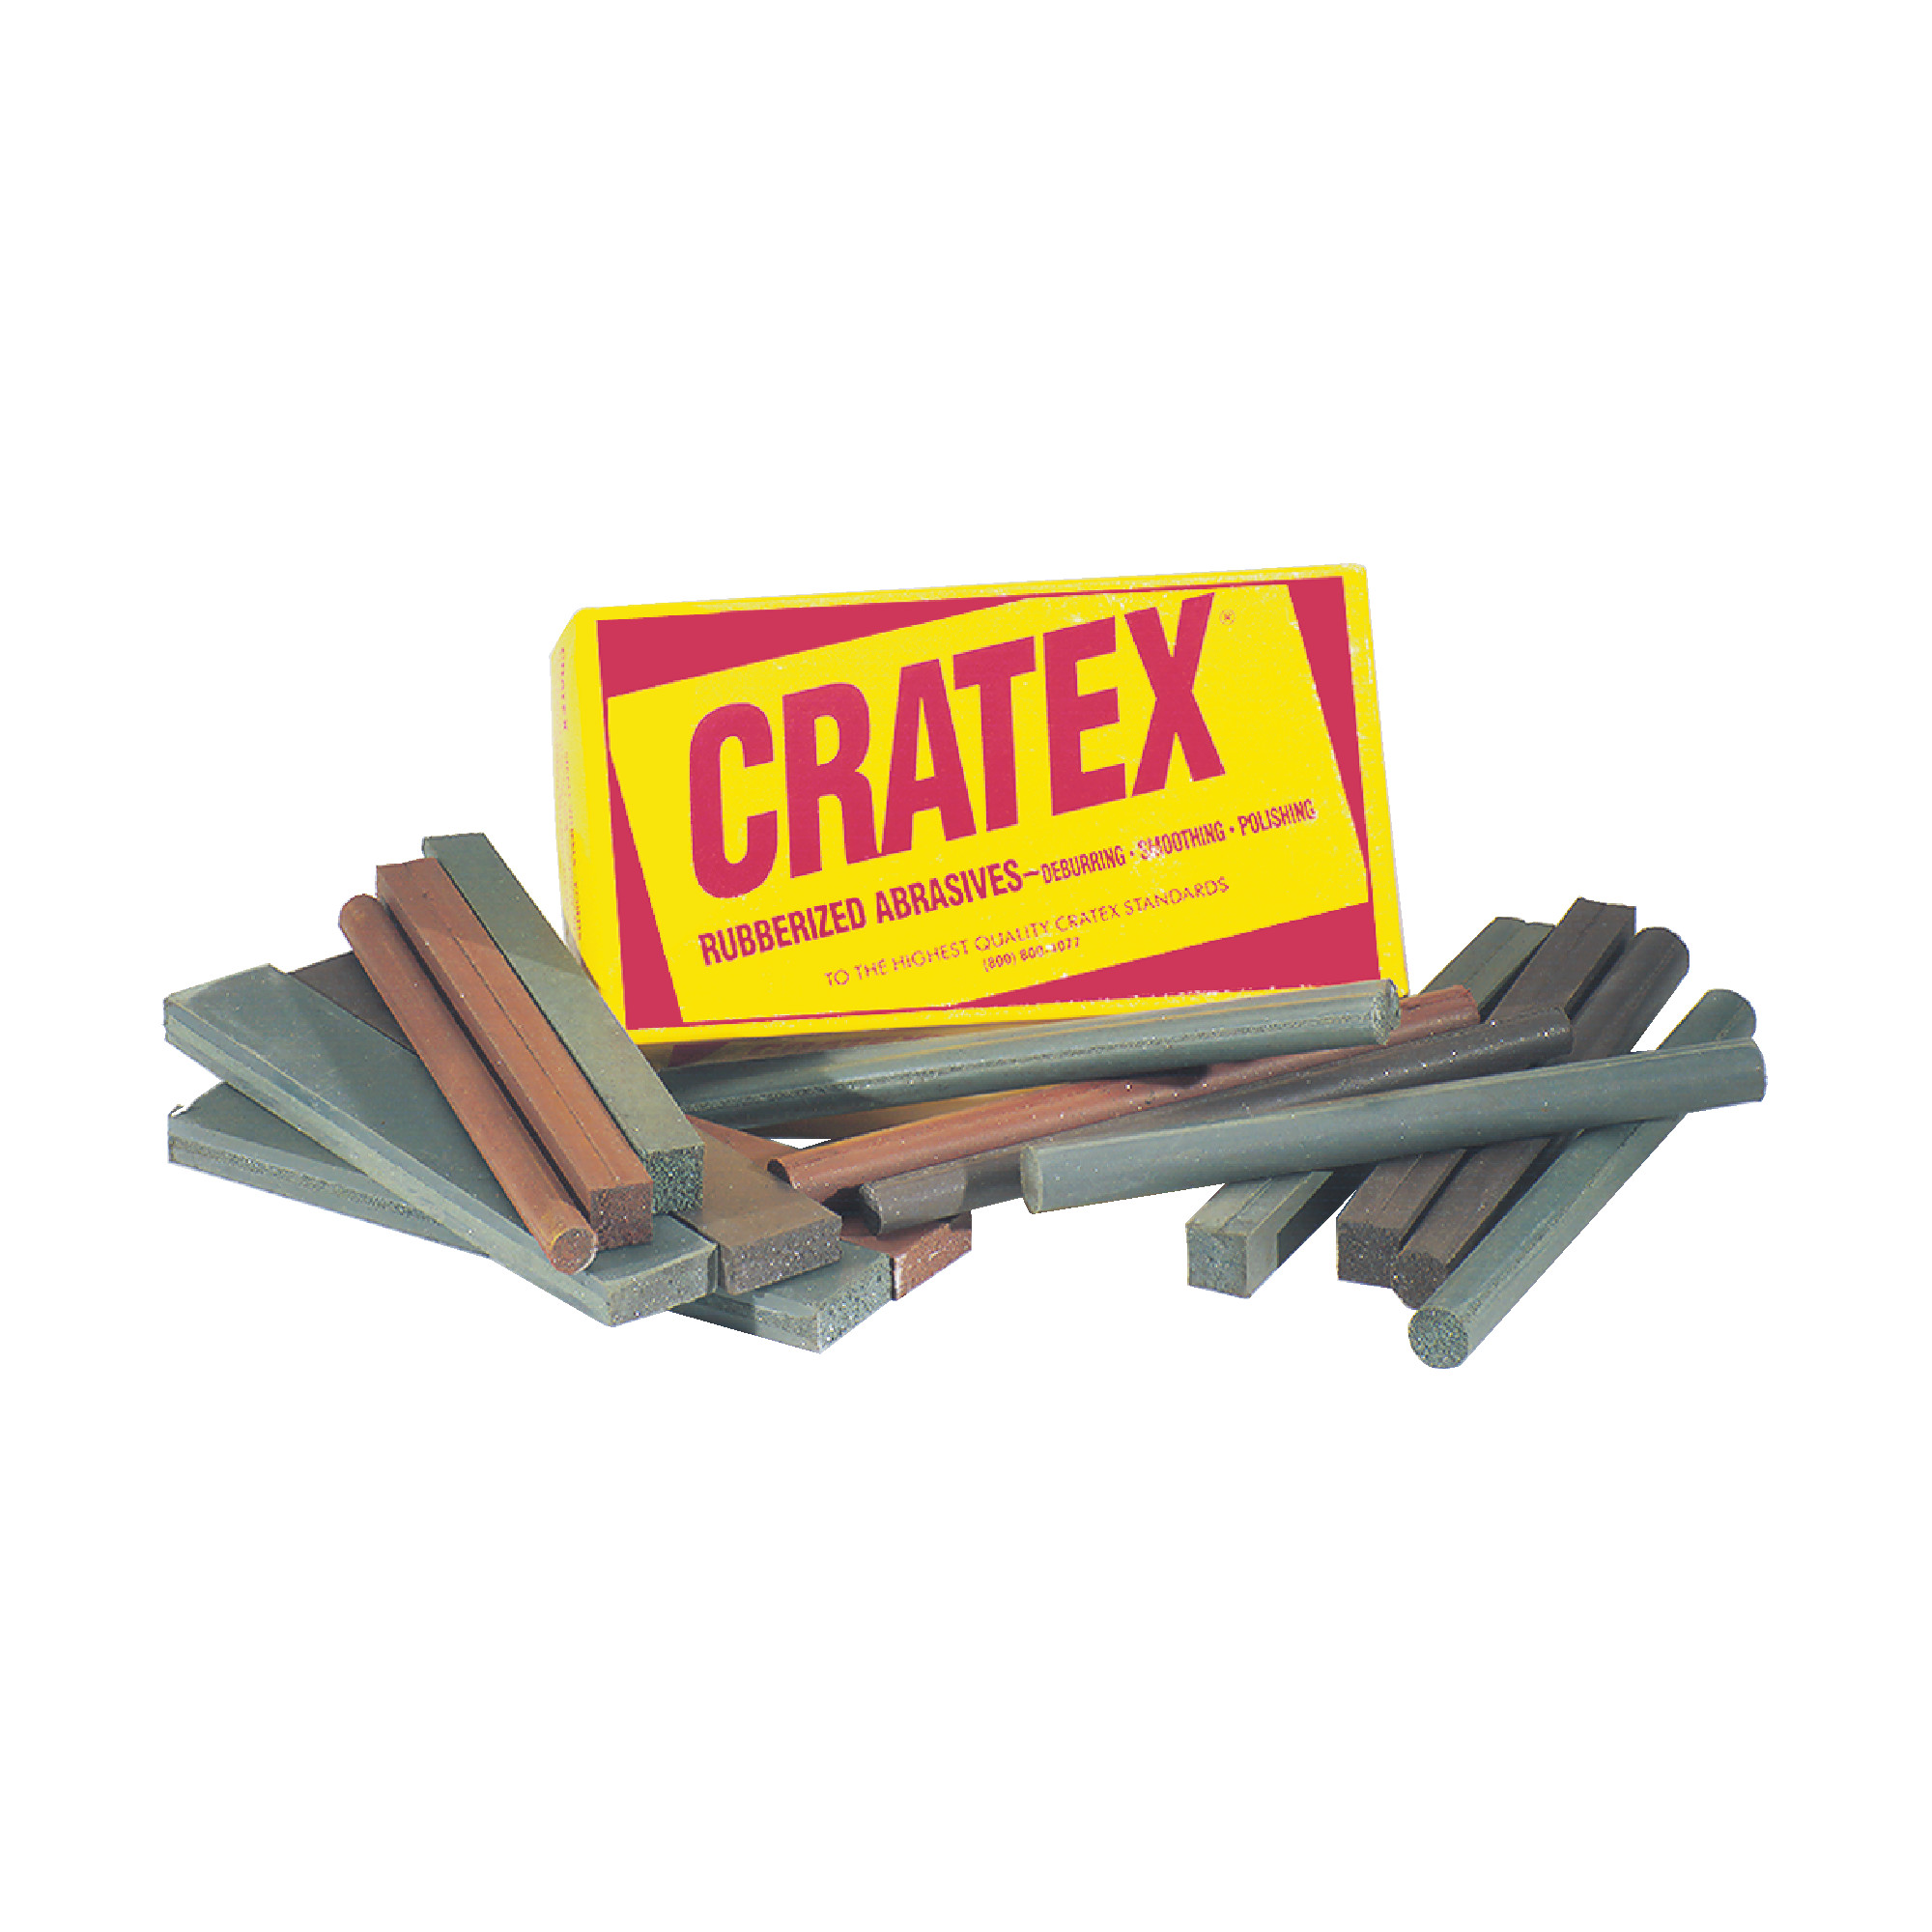 Rubberized Abrasive Block & Stick Test Set